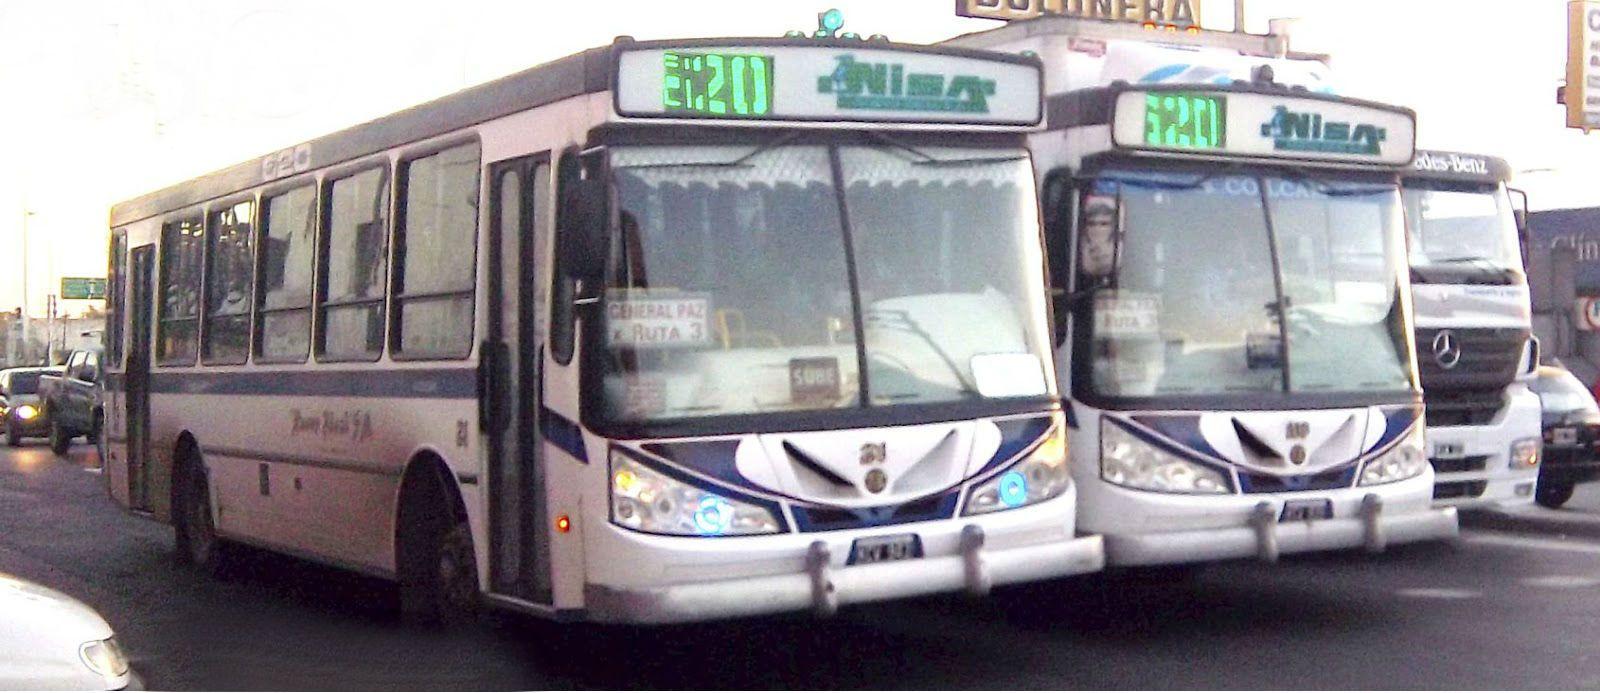 Línea 620